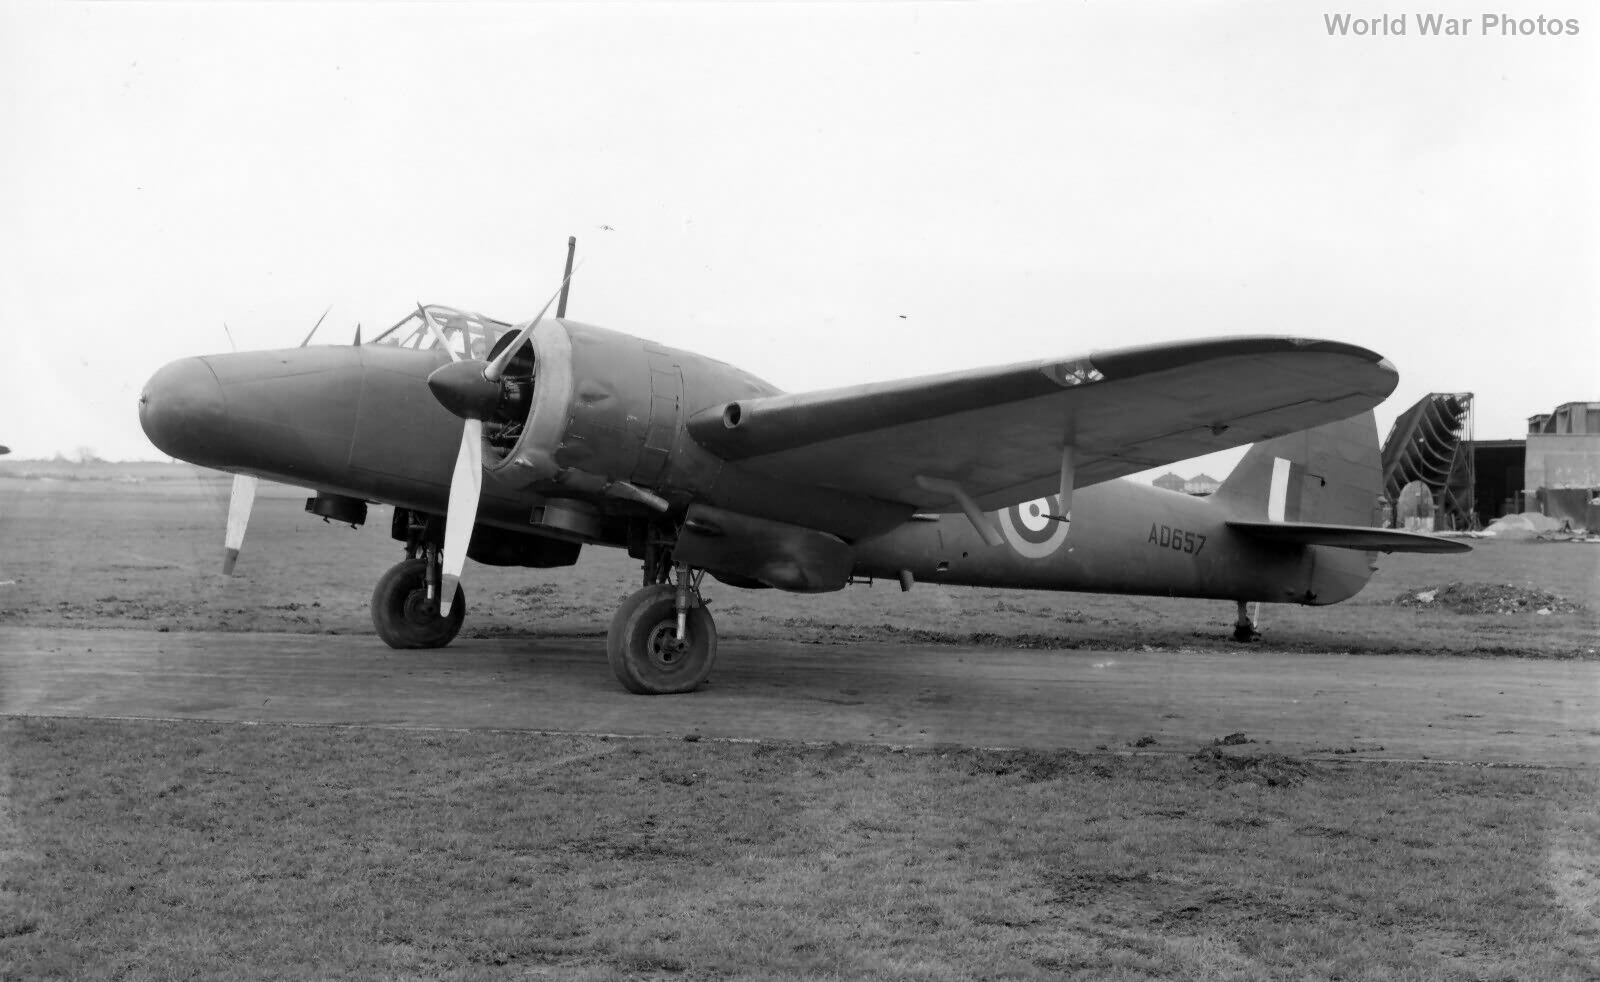 Blenheim V AD657 Bisley Prototype